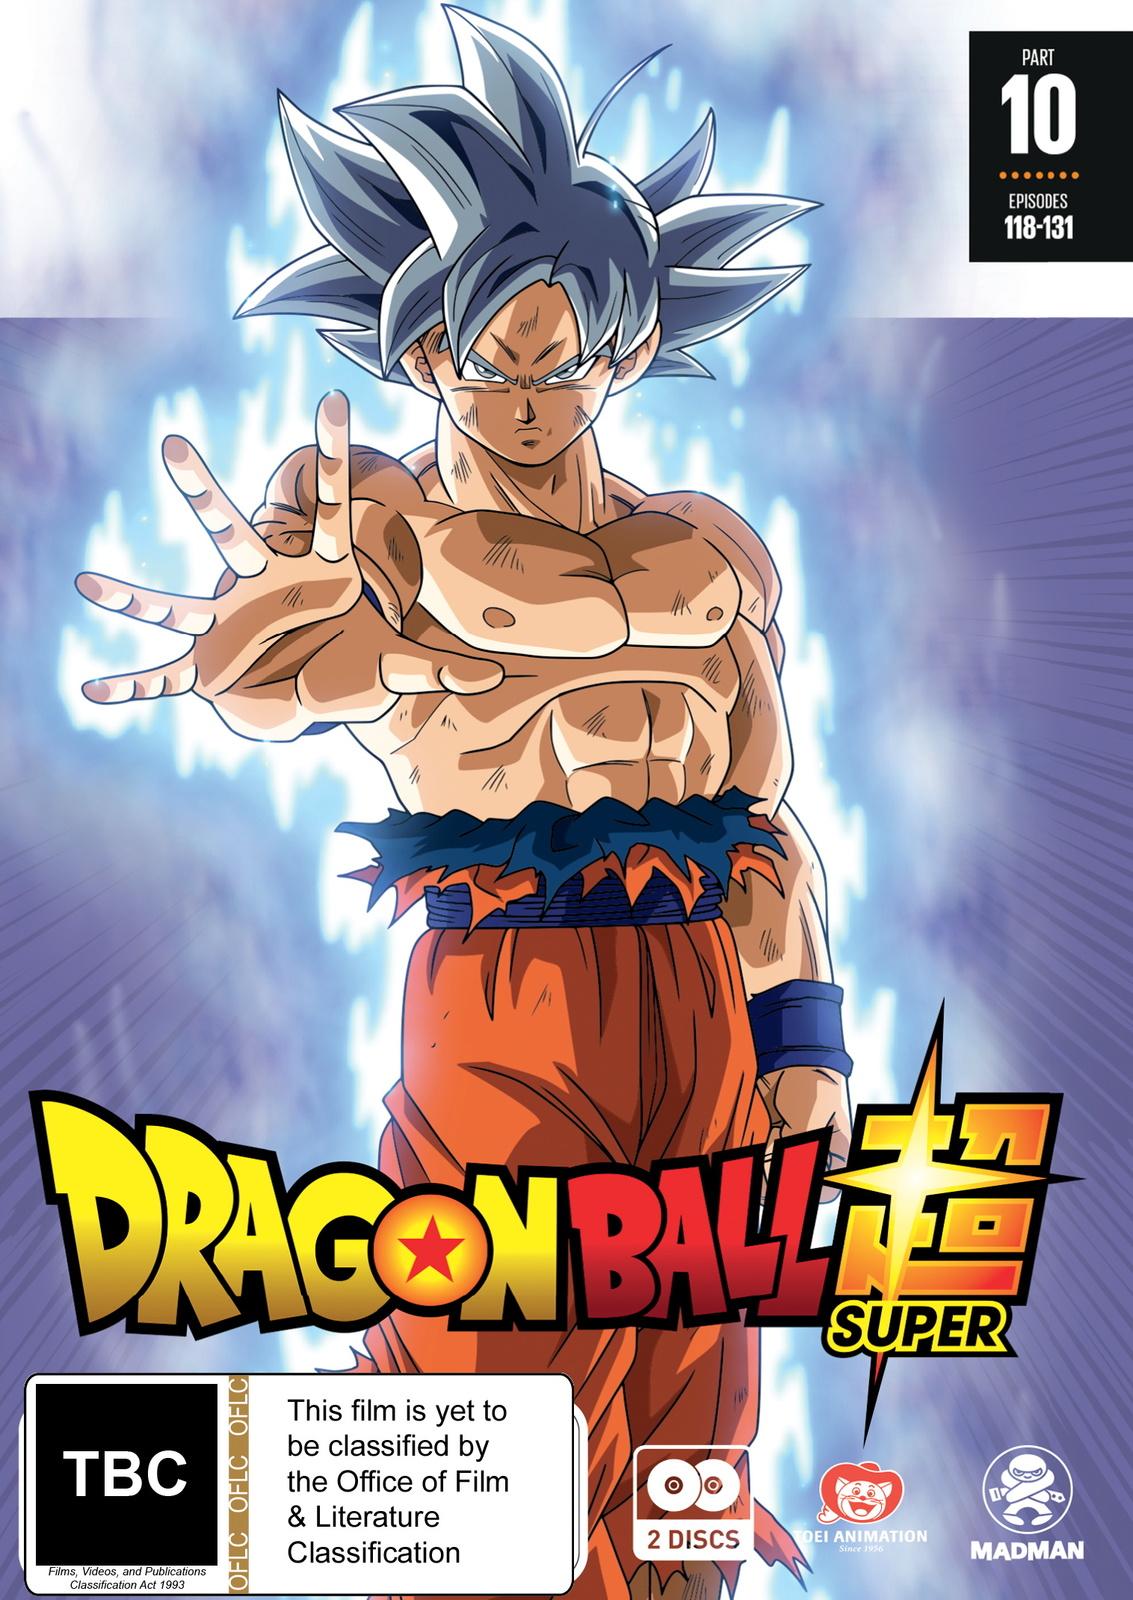 Dragon Ball Super - Part 10 (Eps 118-131) on DVD image